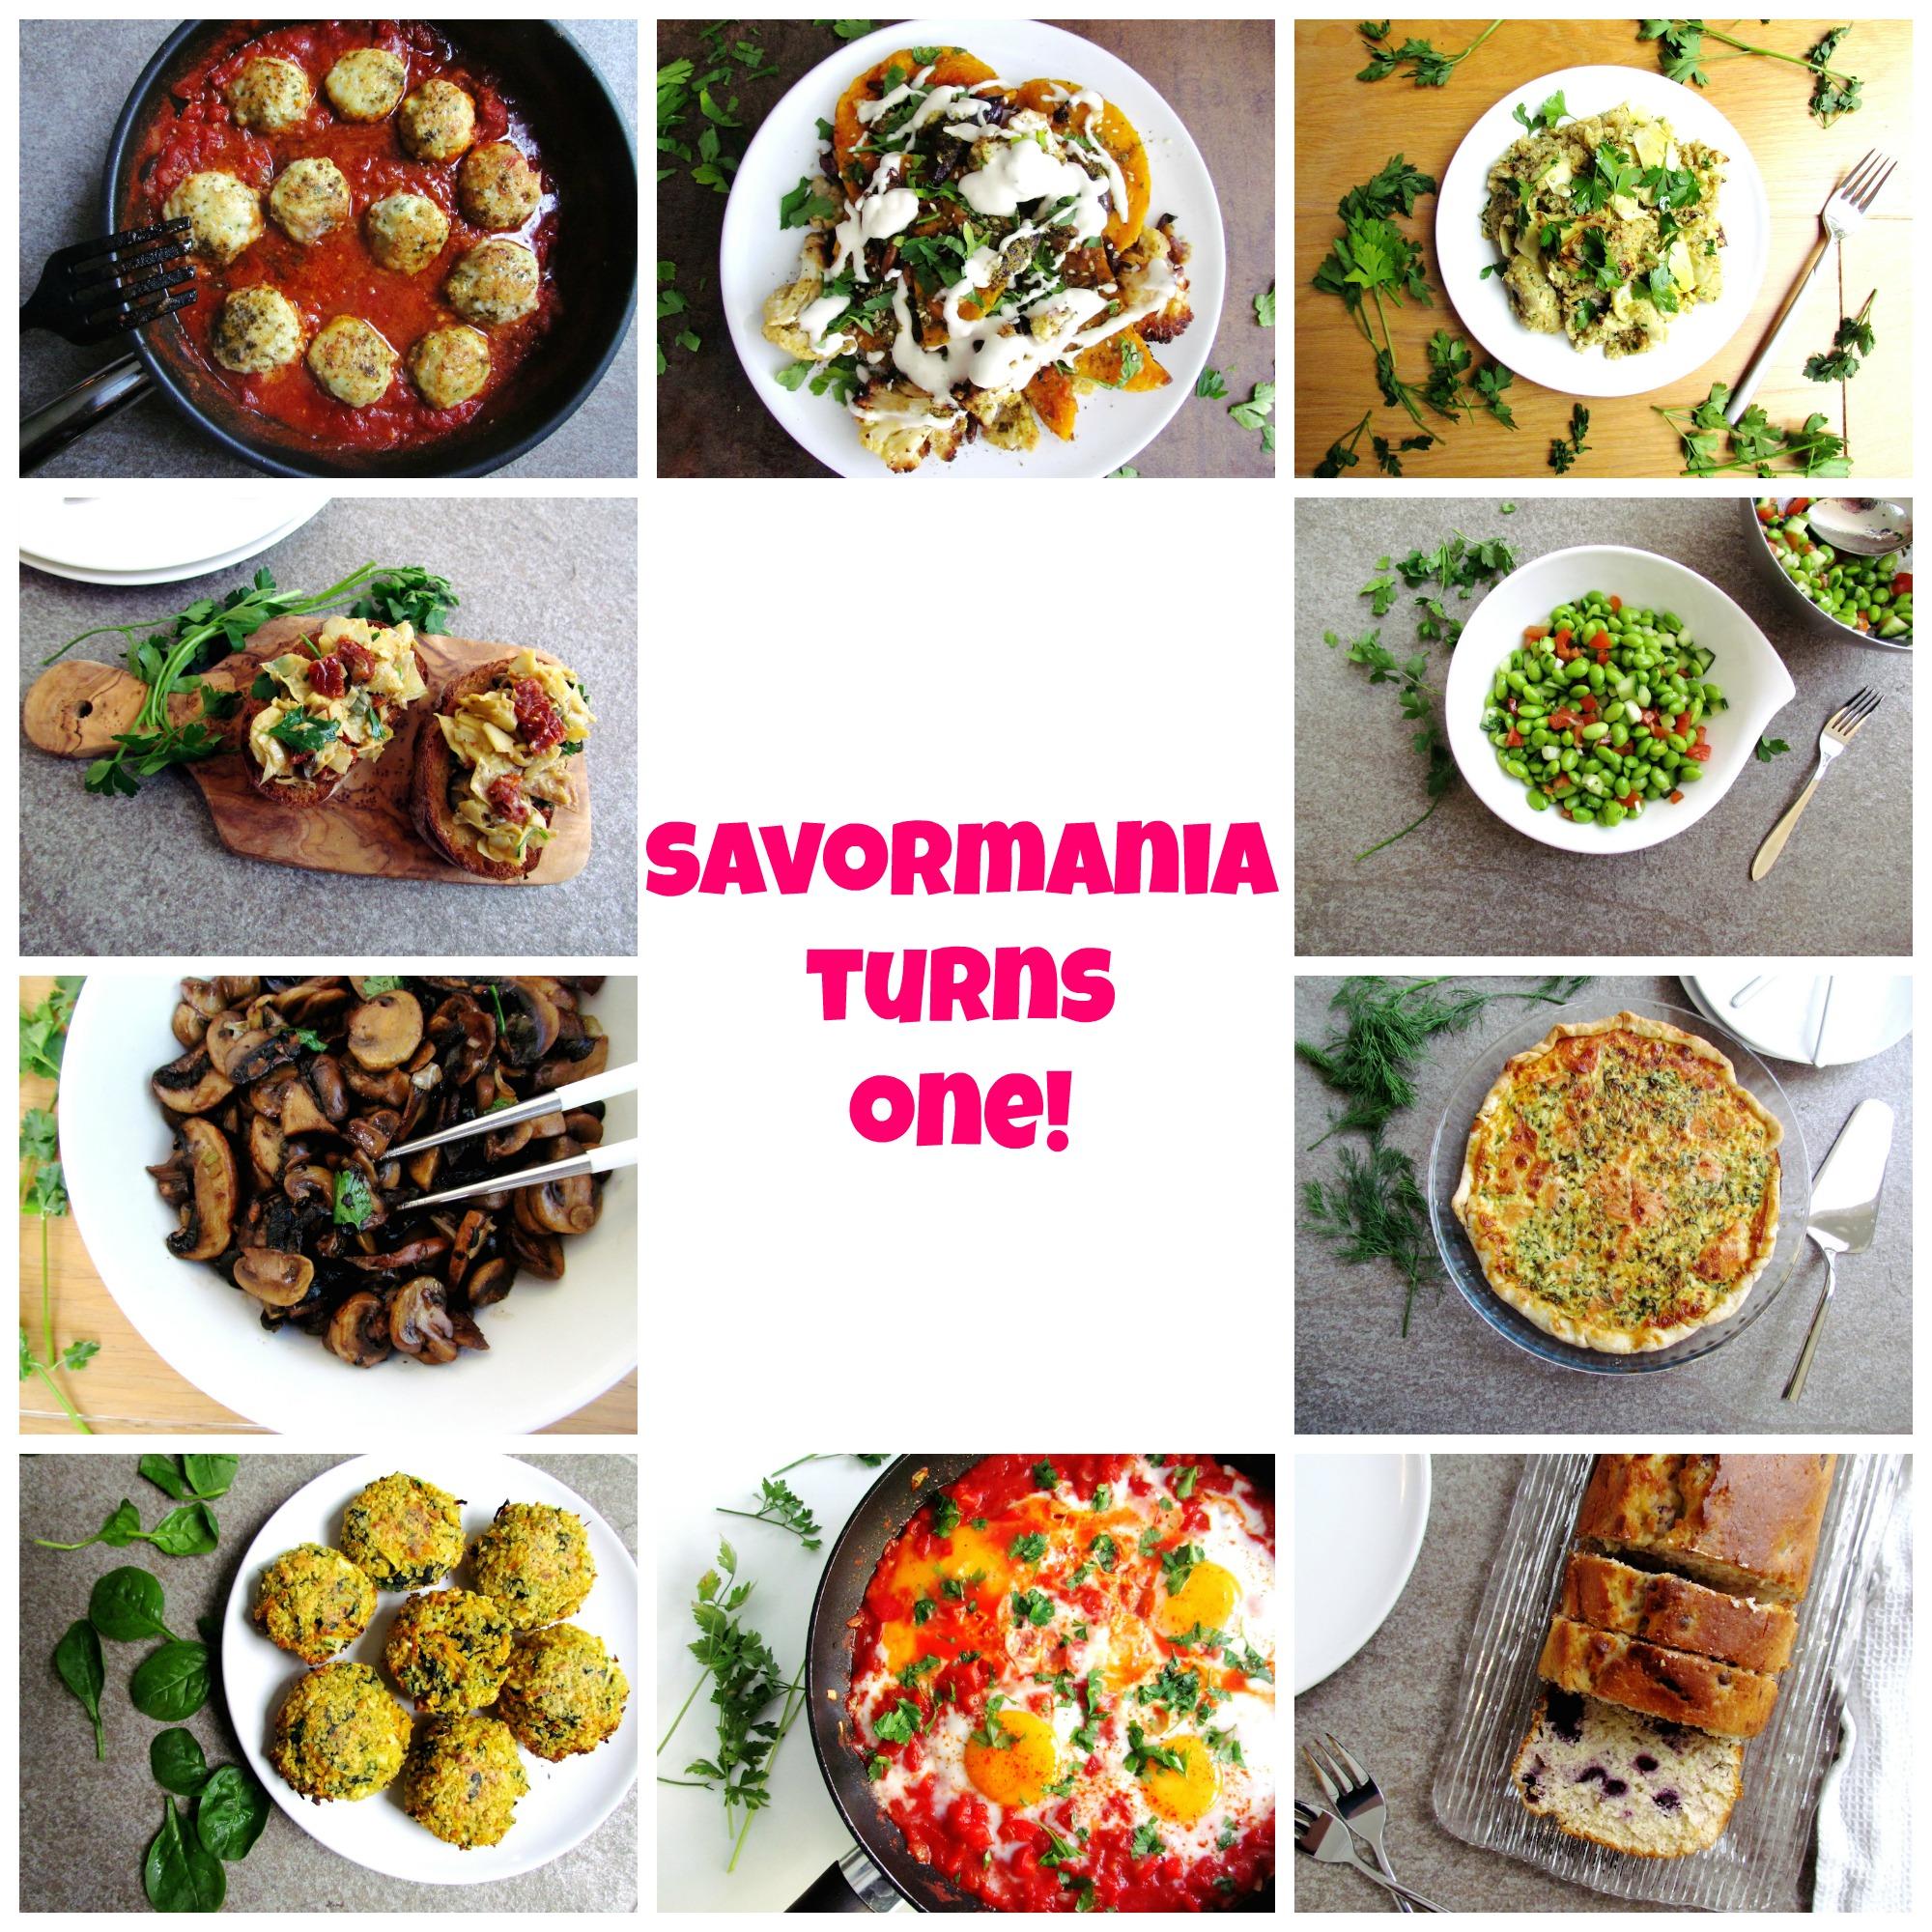 savormania turns 1!